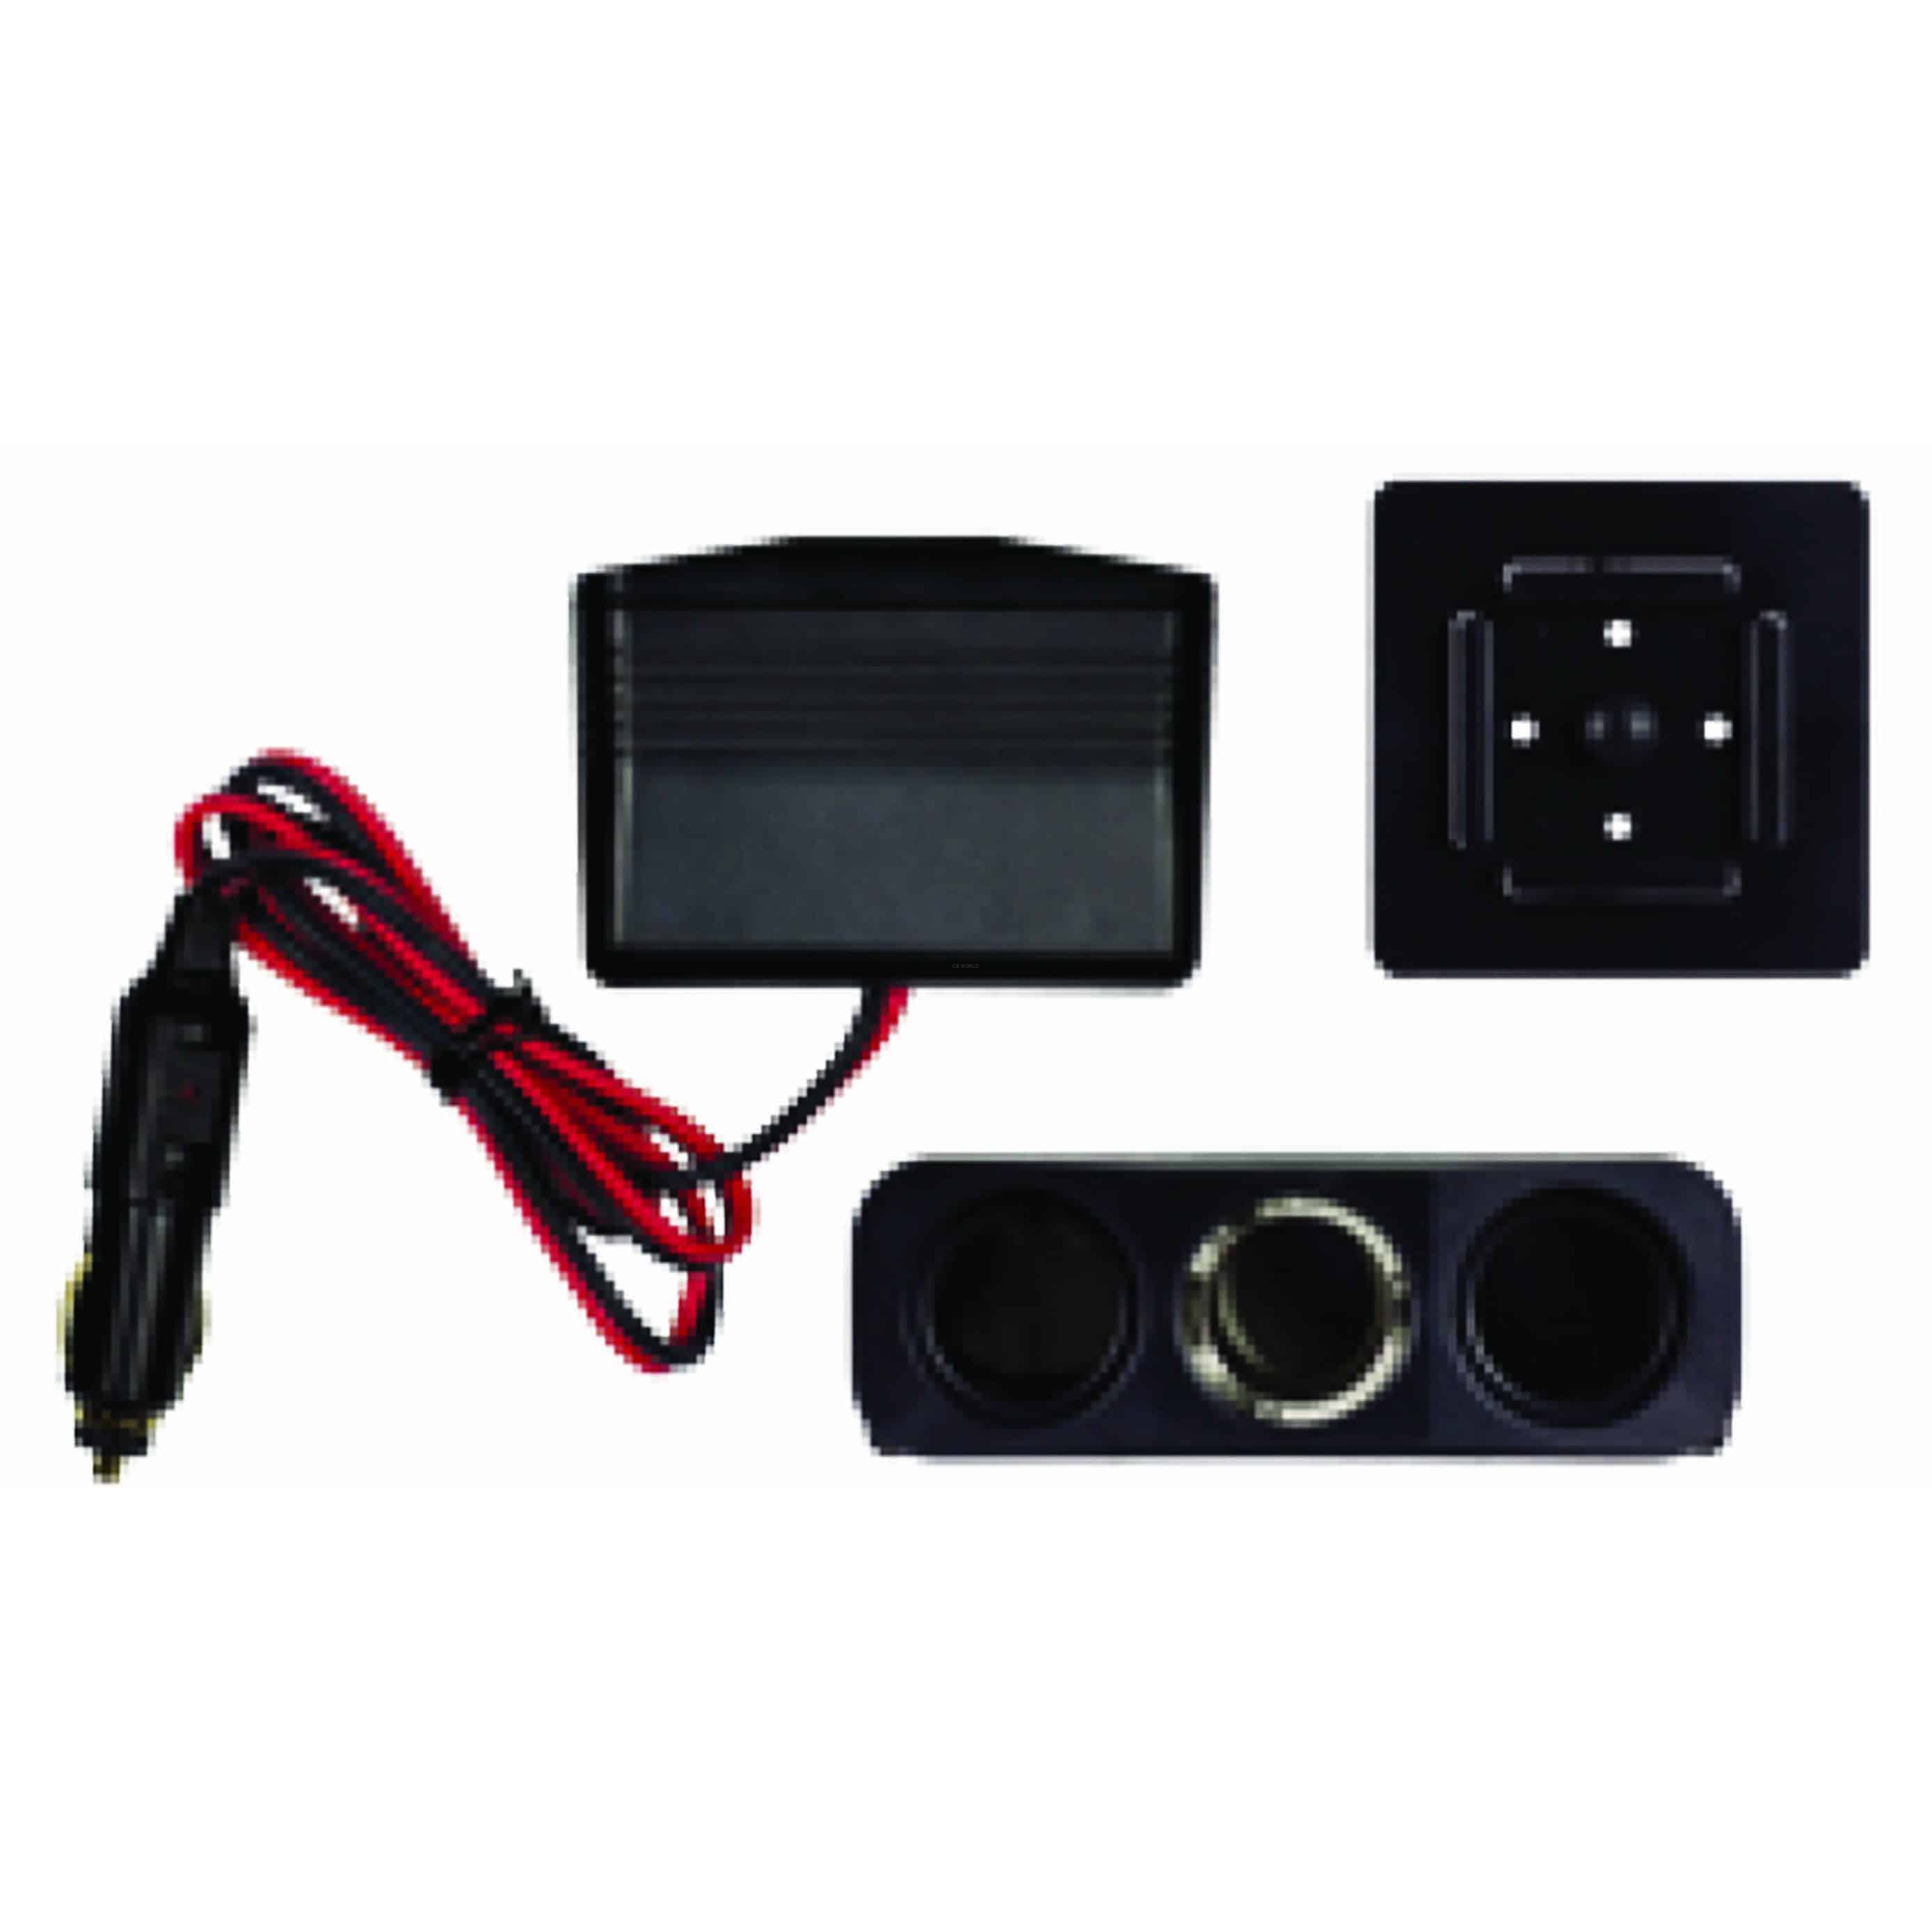 Ckpl50 Metra 12 Volt Under Dash Cigarette Plug Adapter Wiring A